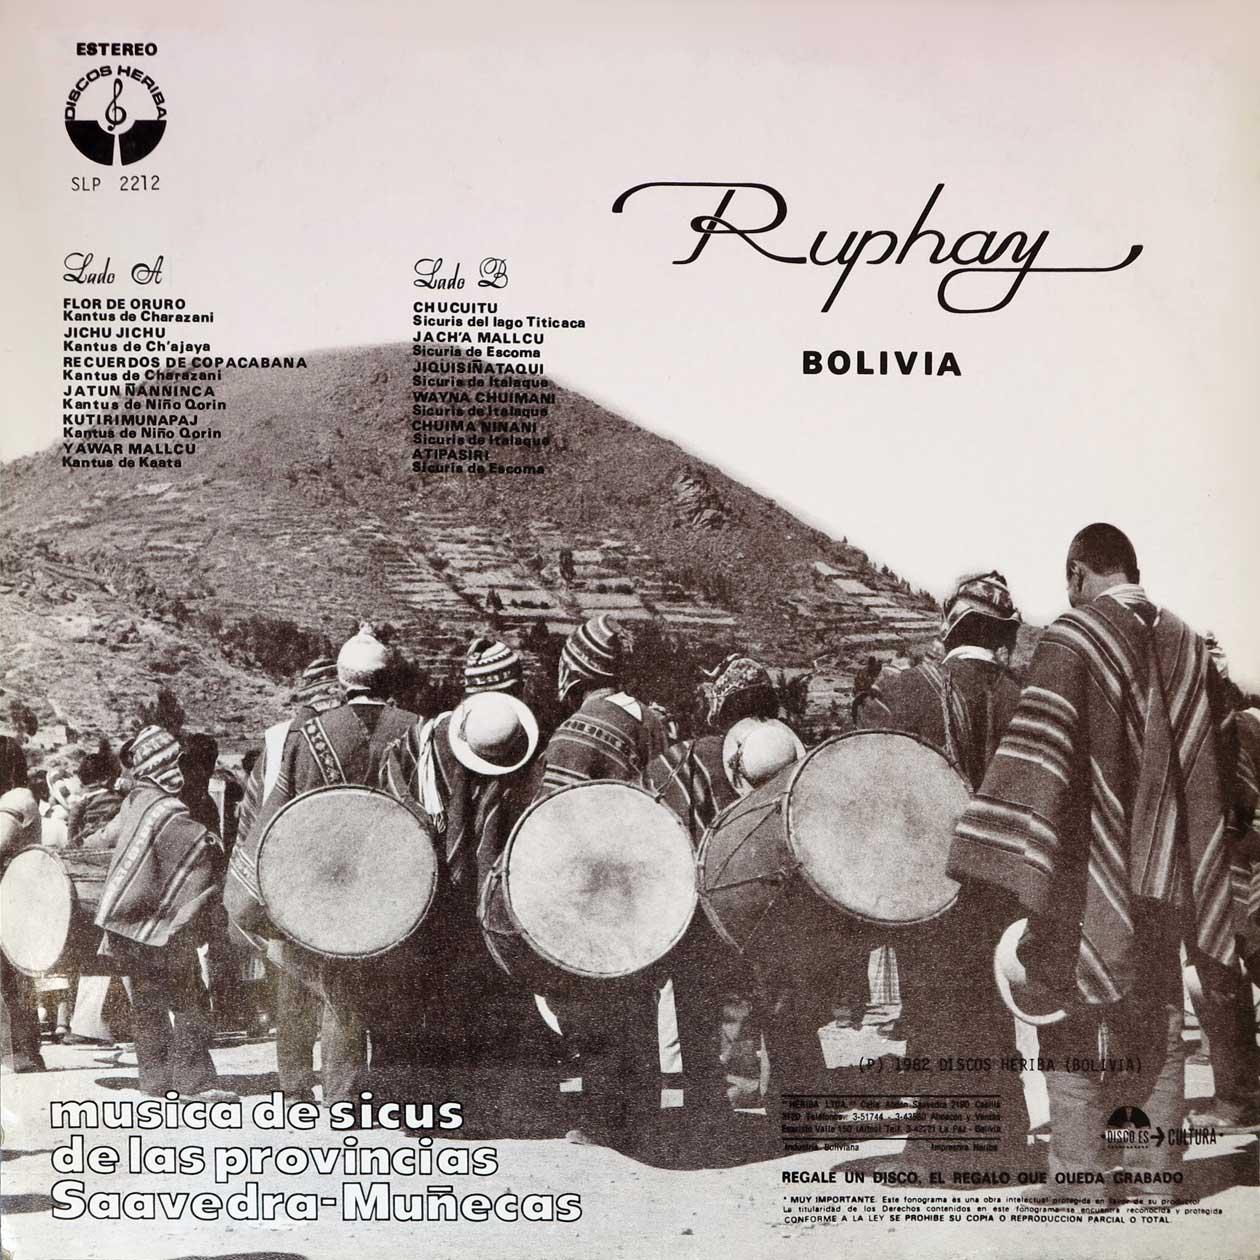 Ruphay - Jach'a Marka